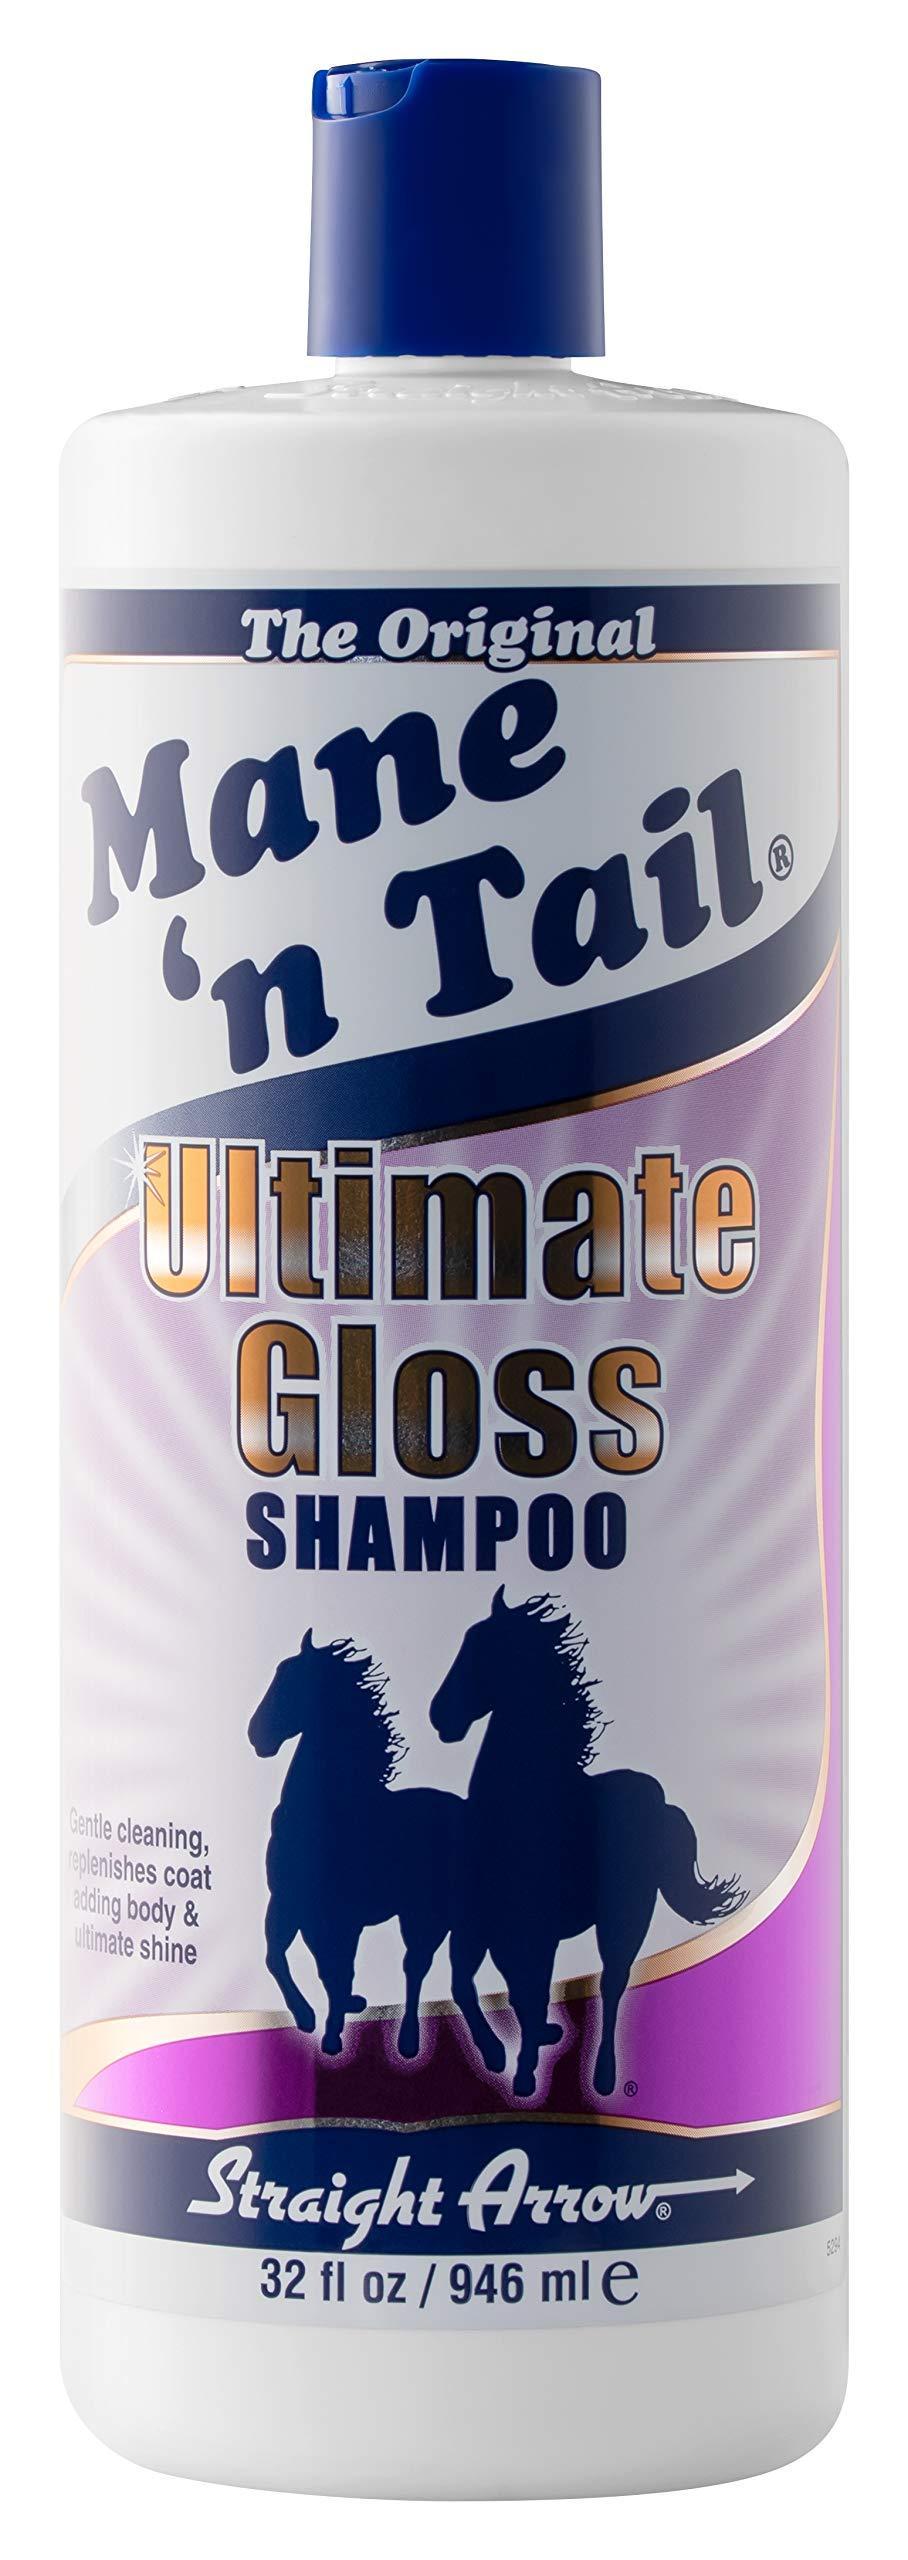 Mane 'n Tail New Ultimate Gloss Shampoo 32oz by Mane 'n Tail